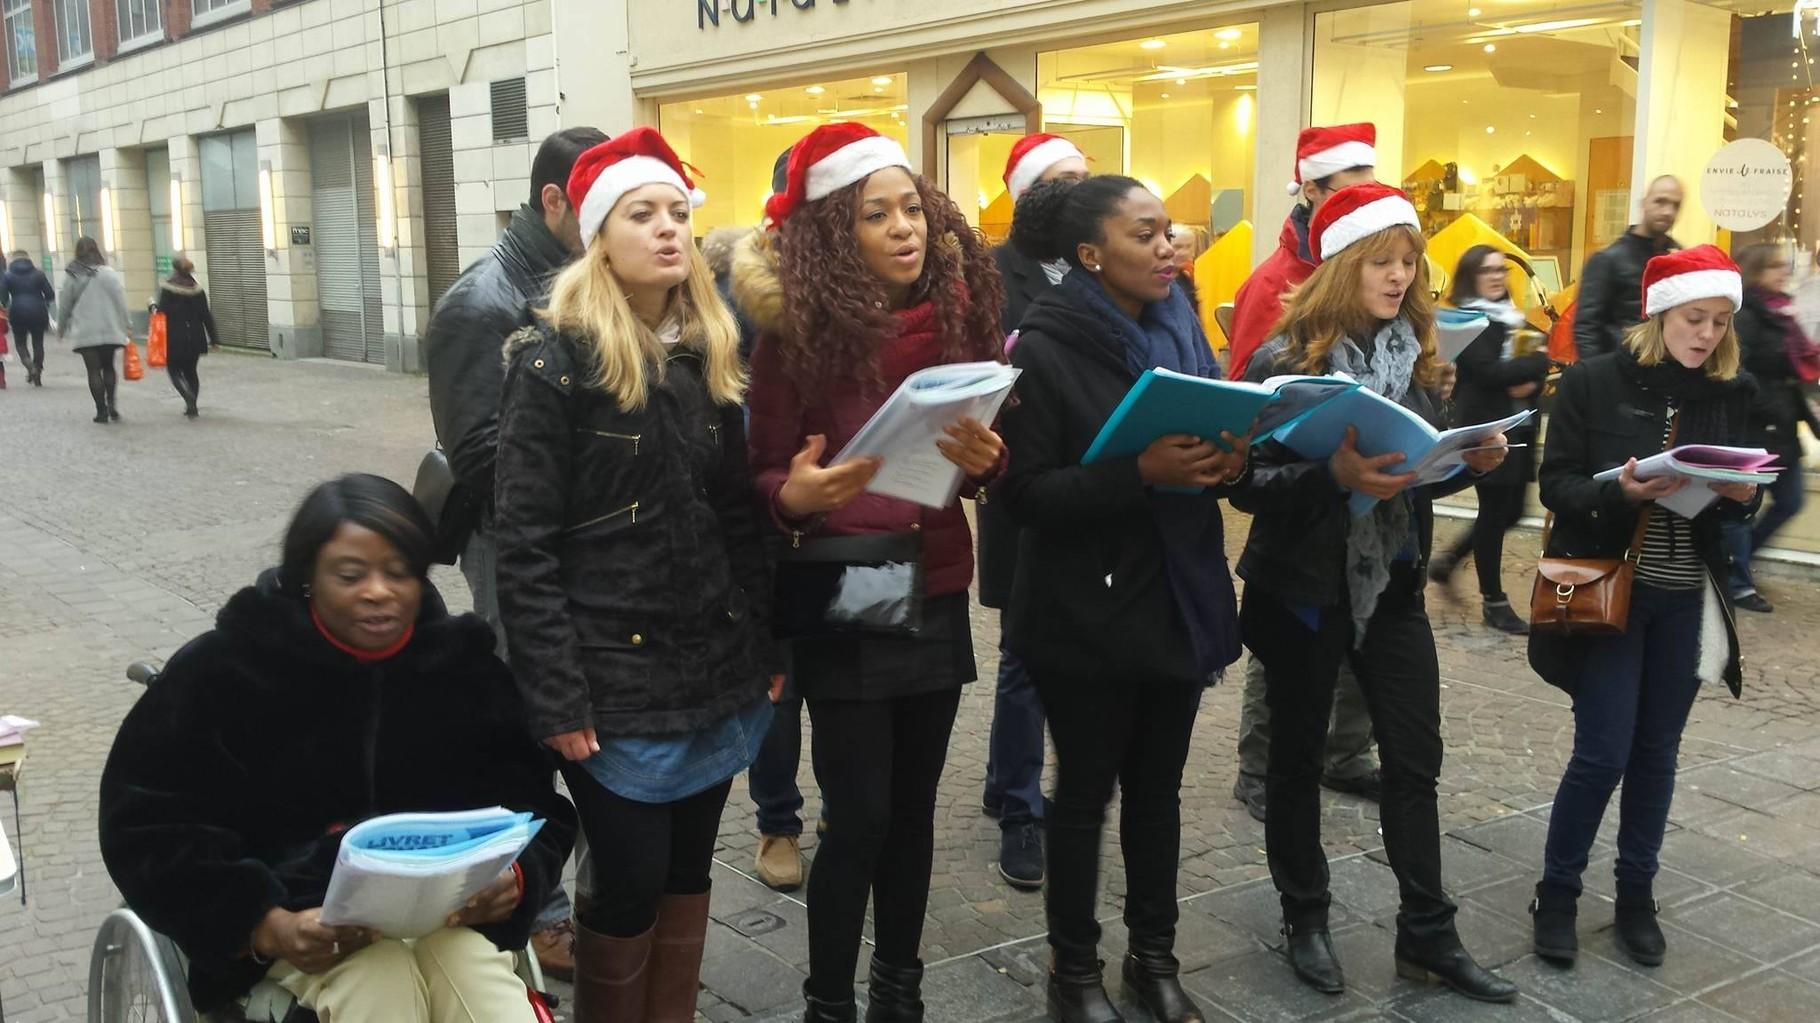 La petite chorale de Noël